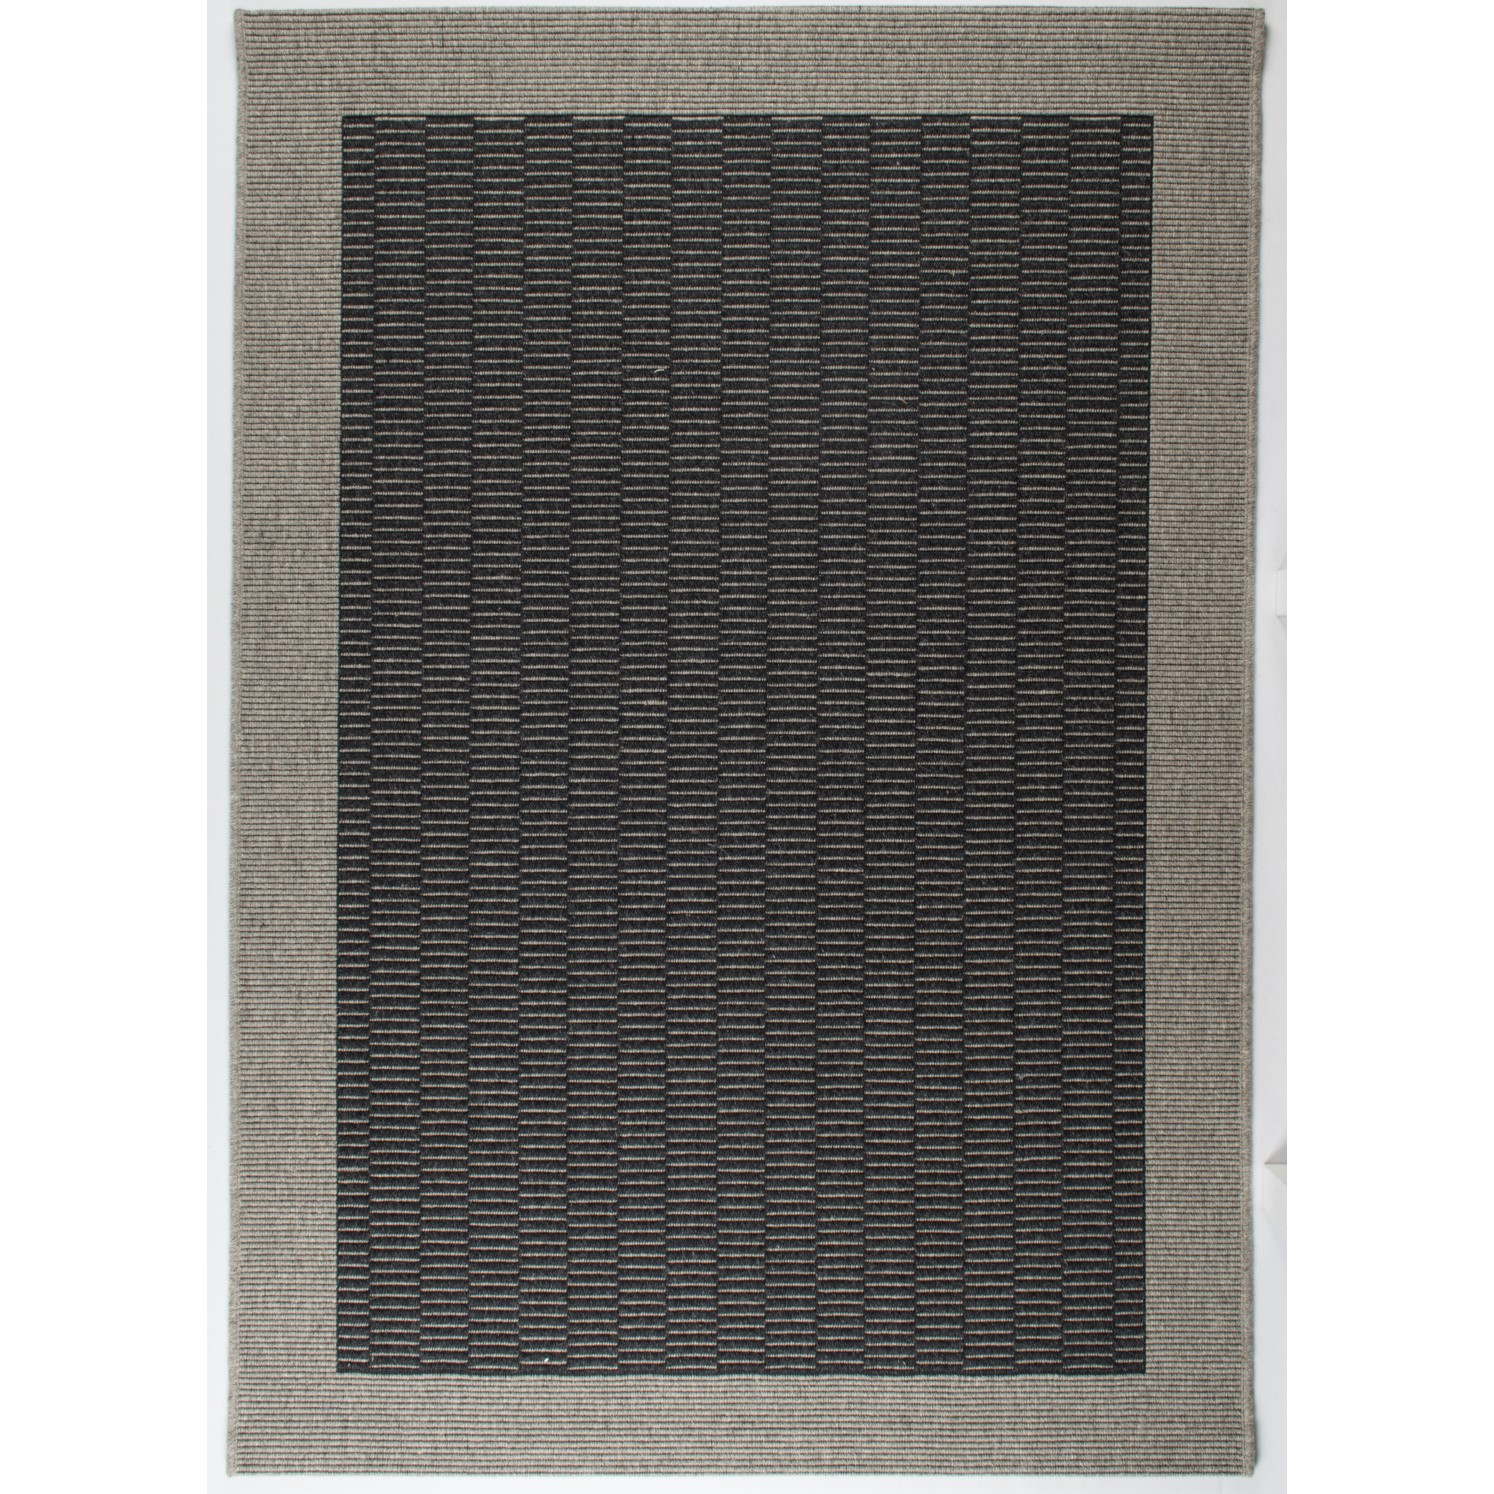 Teppich Tunis   Hellgrau-133 x 195 cm